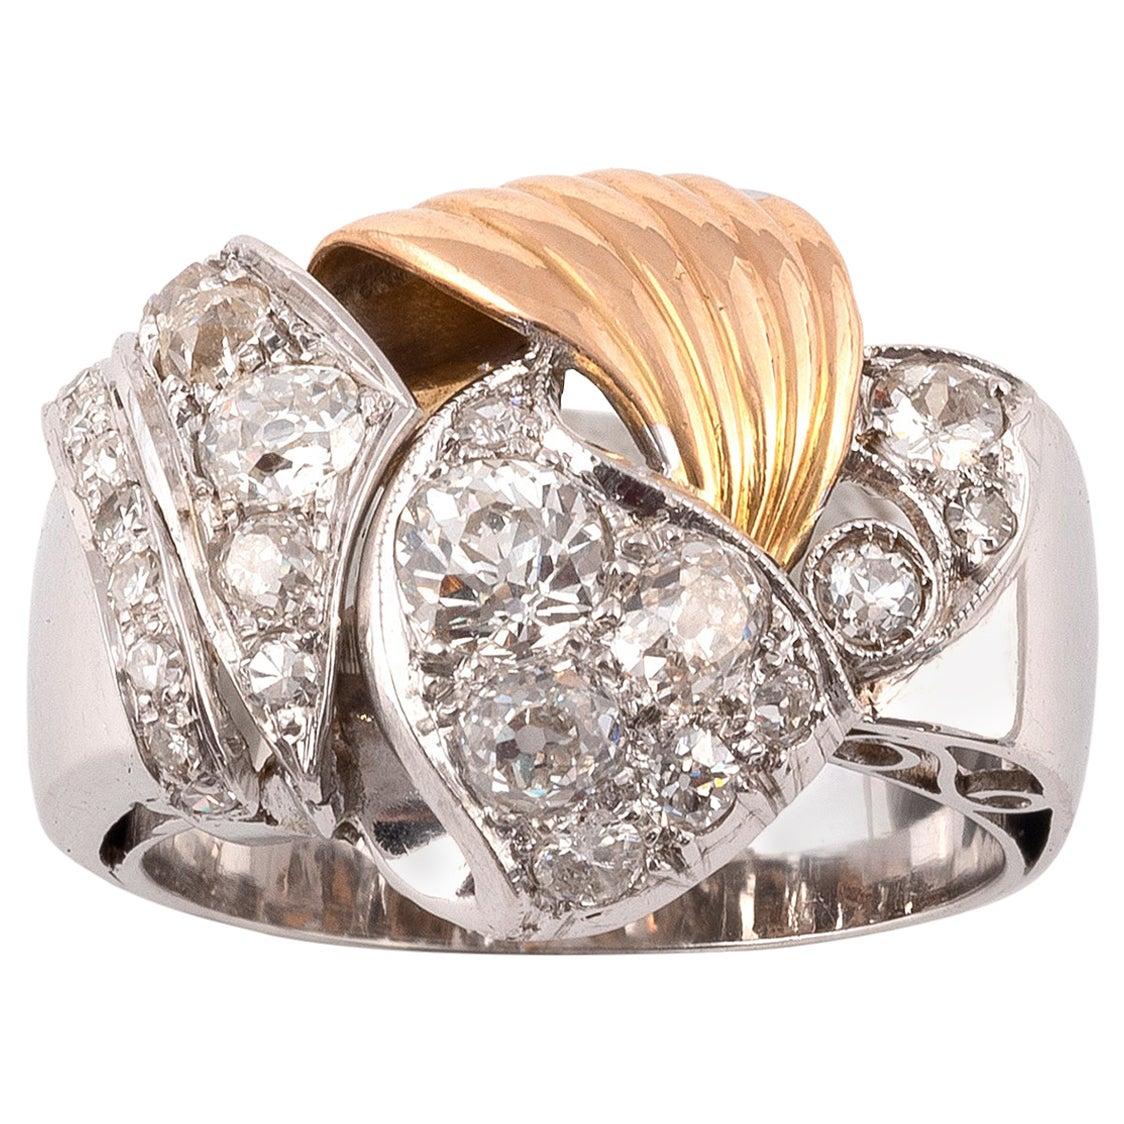 18 Karat White and Yellow Gold Diamond Retro Ring